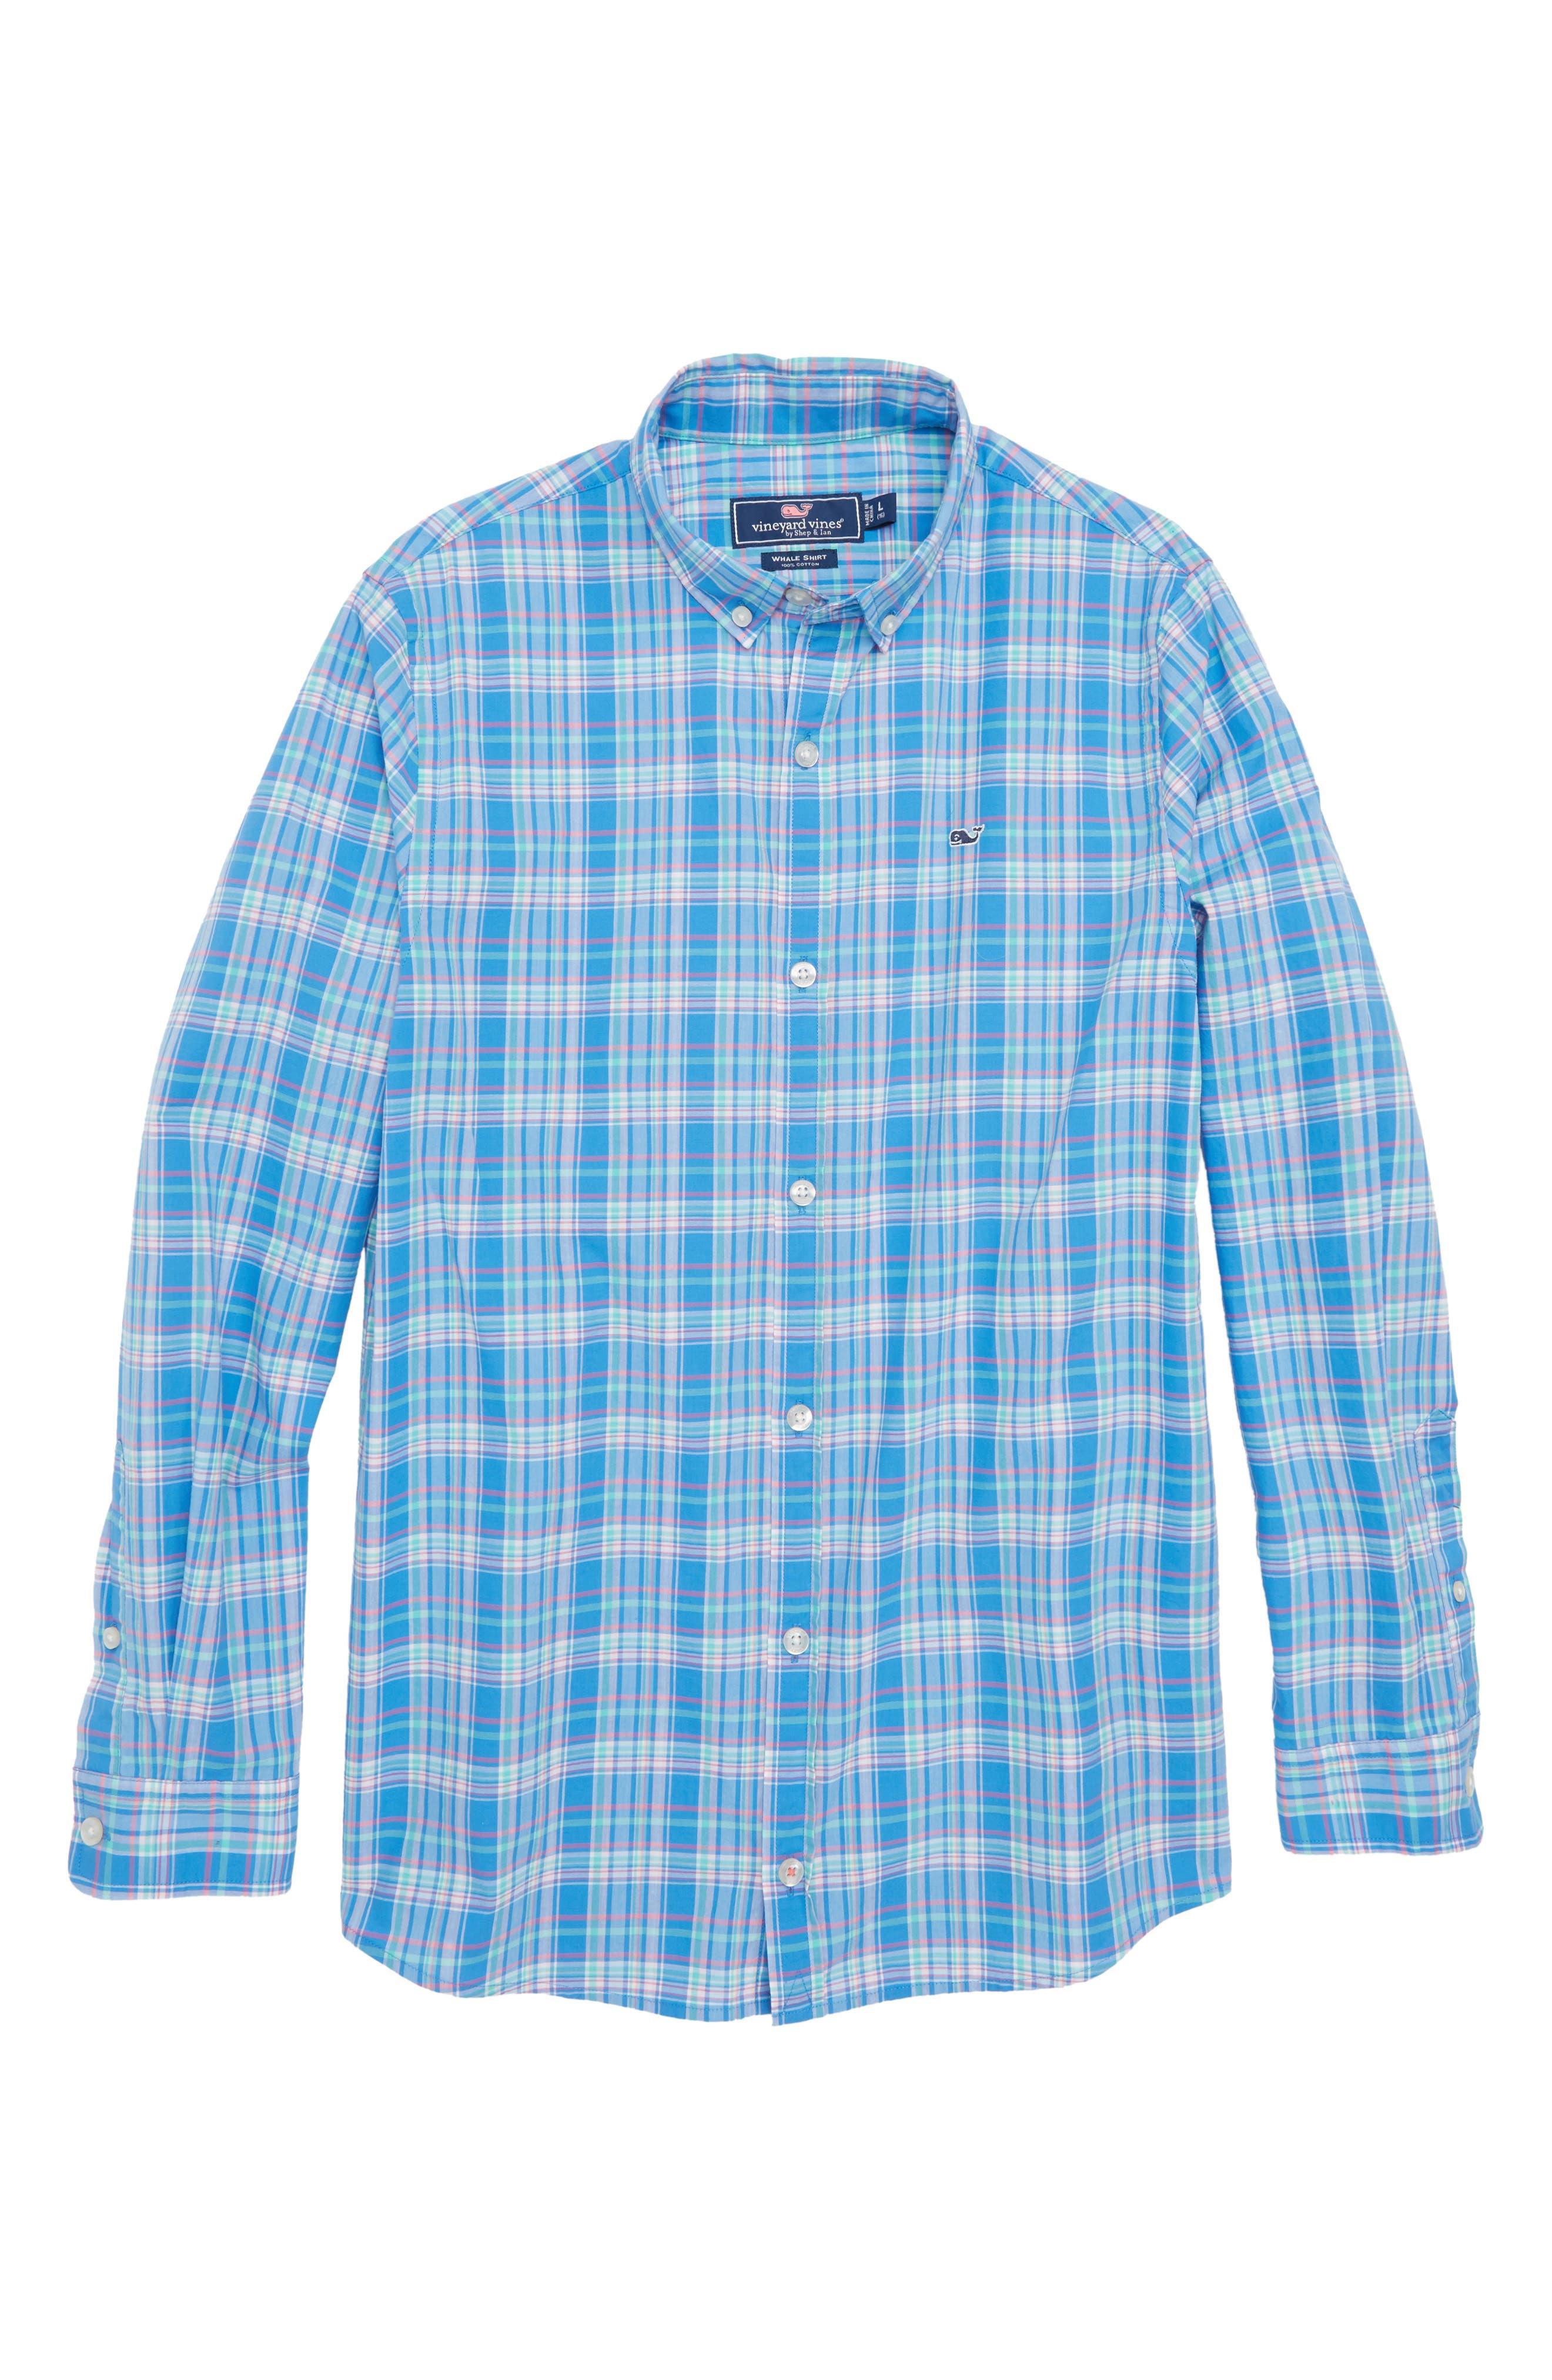 Bita Bay Plaid Shirt,                             Main thumbnail 1, color,                             Hull Blue